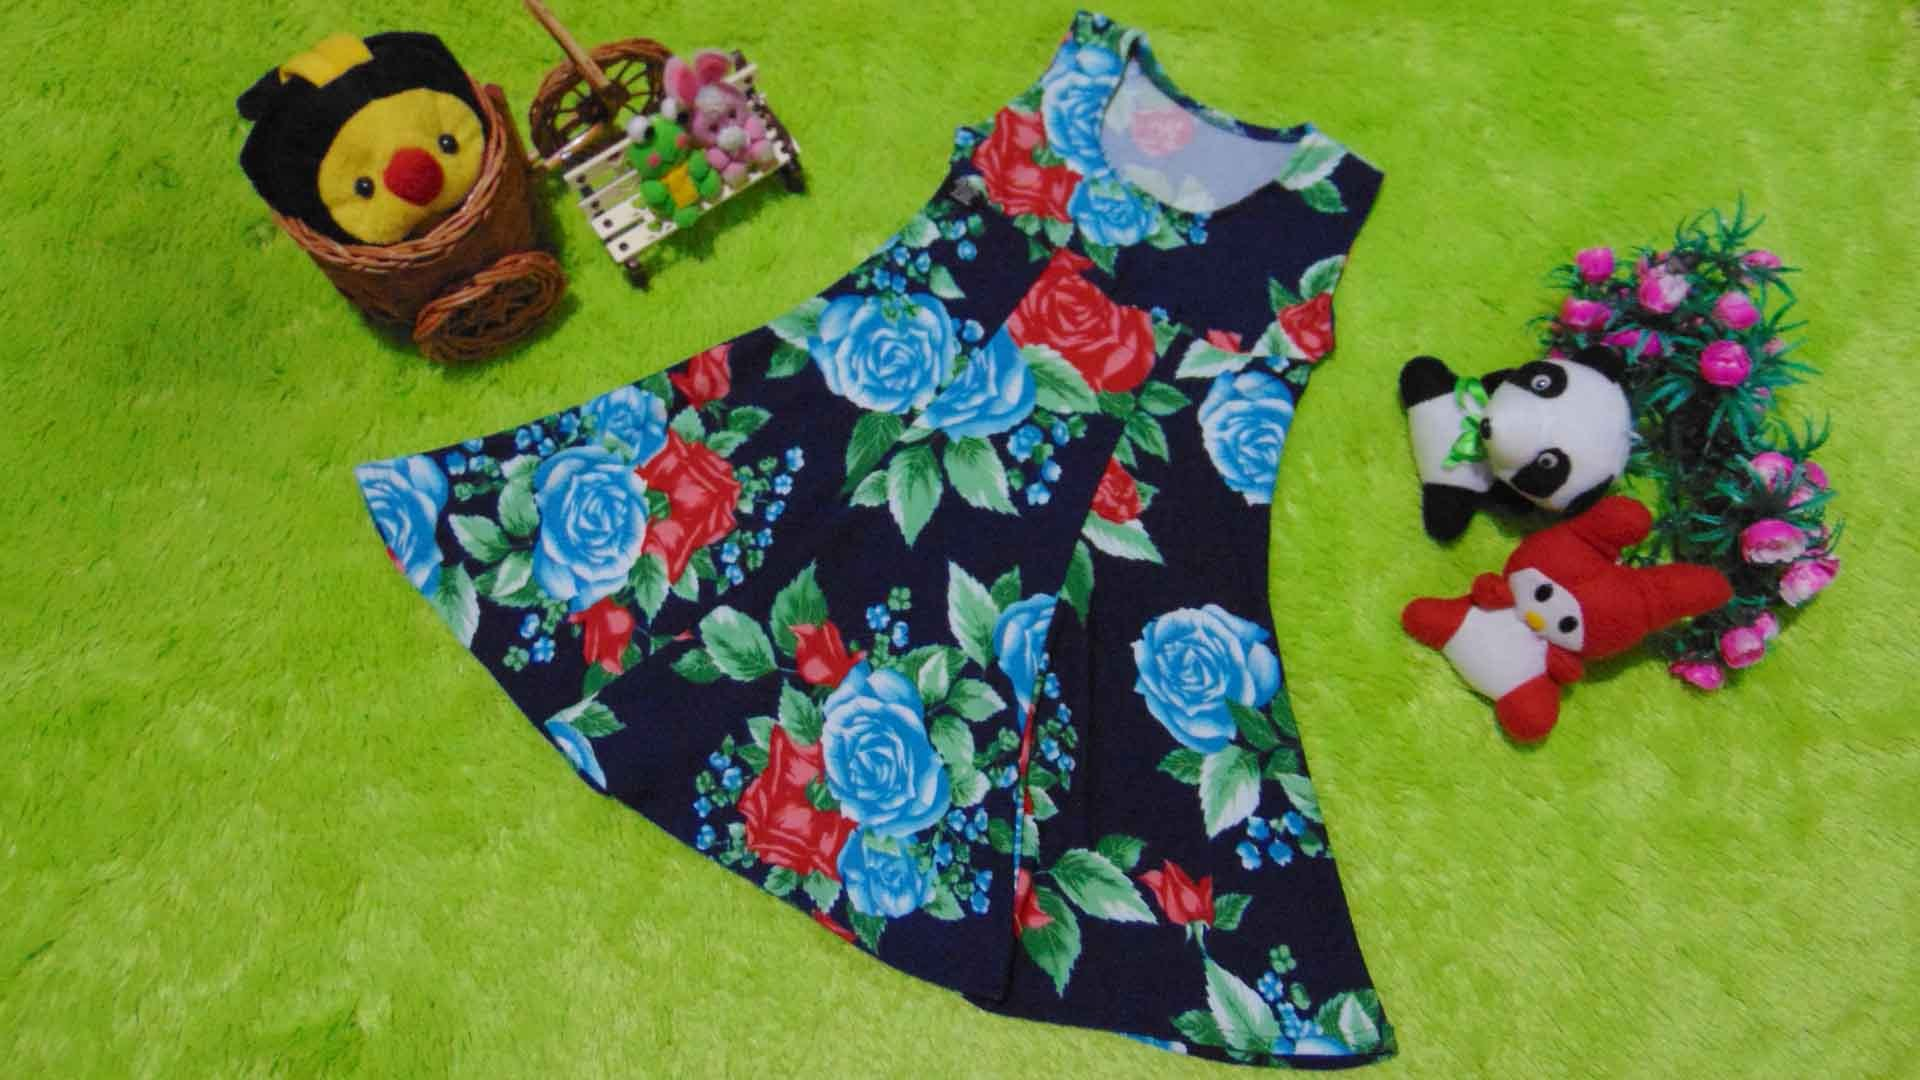 Bentuk Baju Lebaran Bayi 6 Bulan X8d1 Dress Baju Bayi Perempuan Newborn 0 6 Bulan Misby Flower